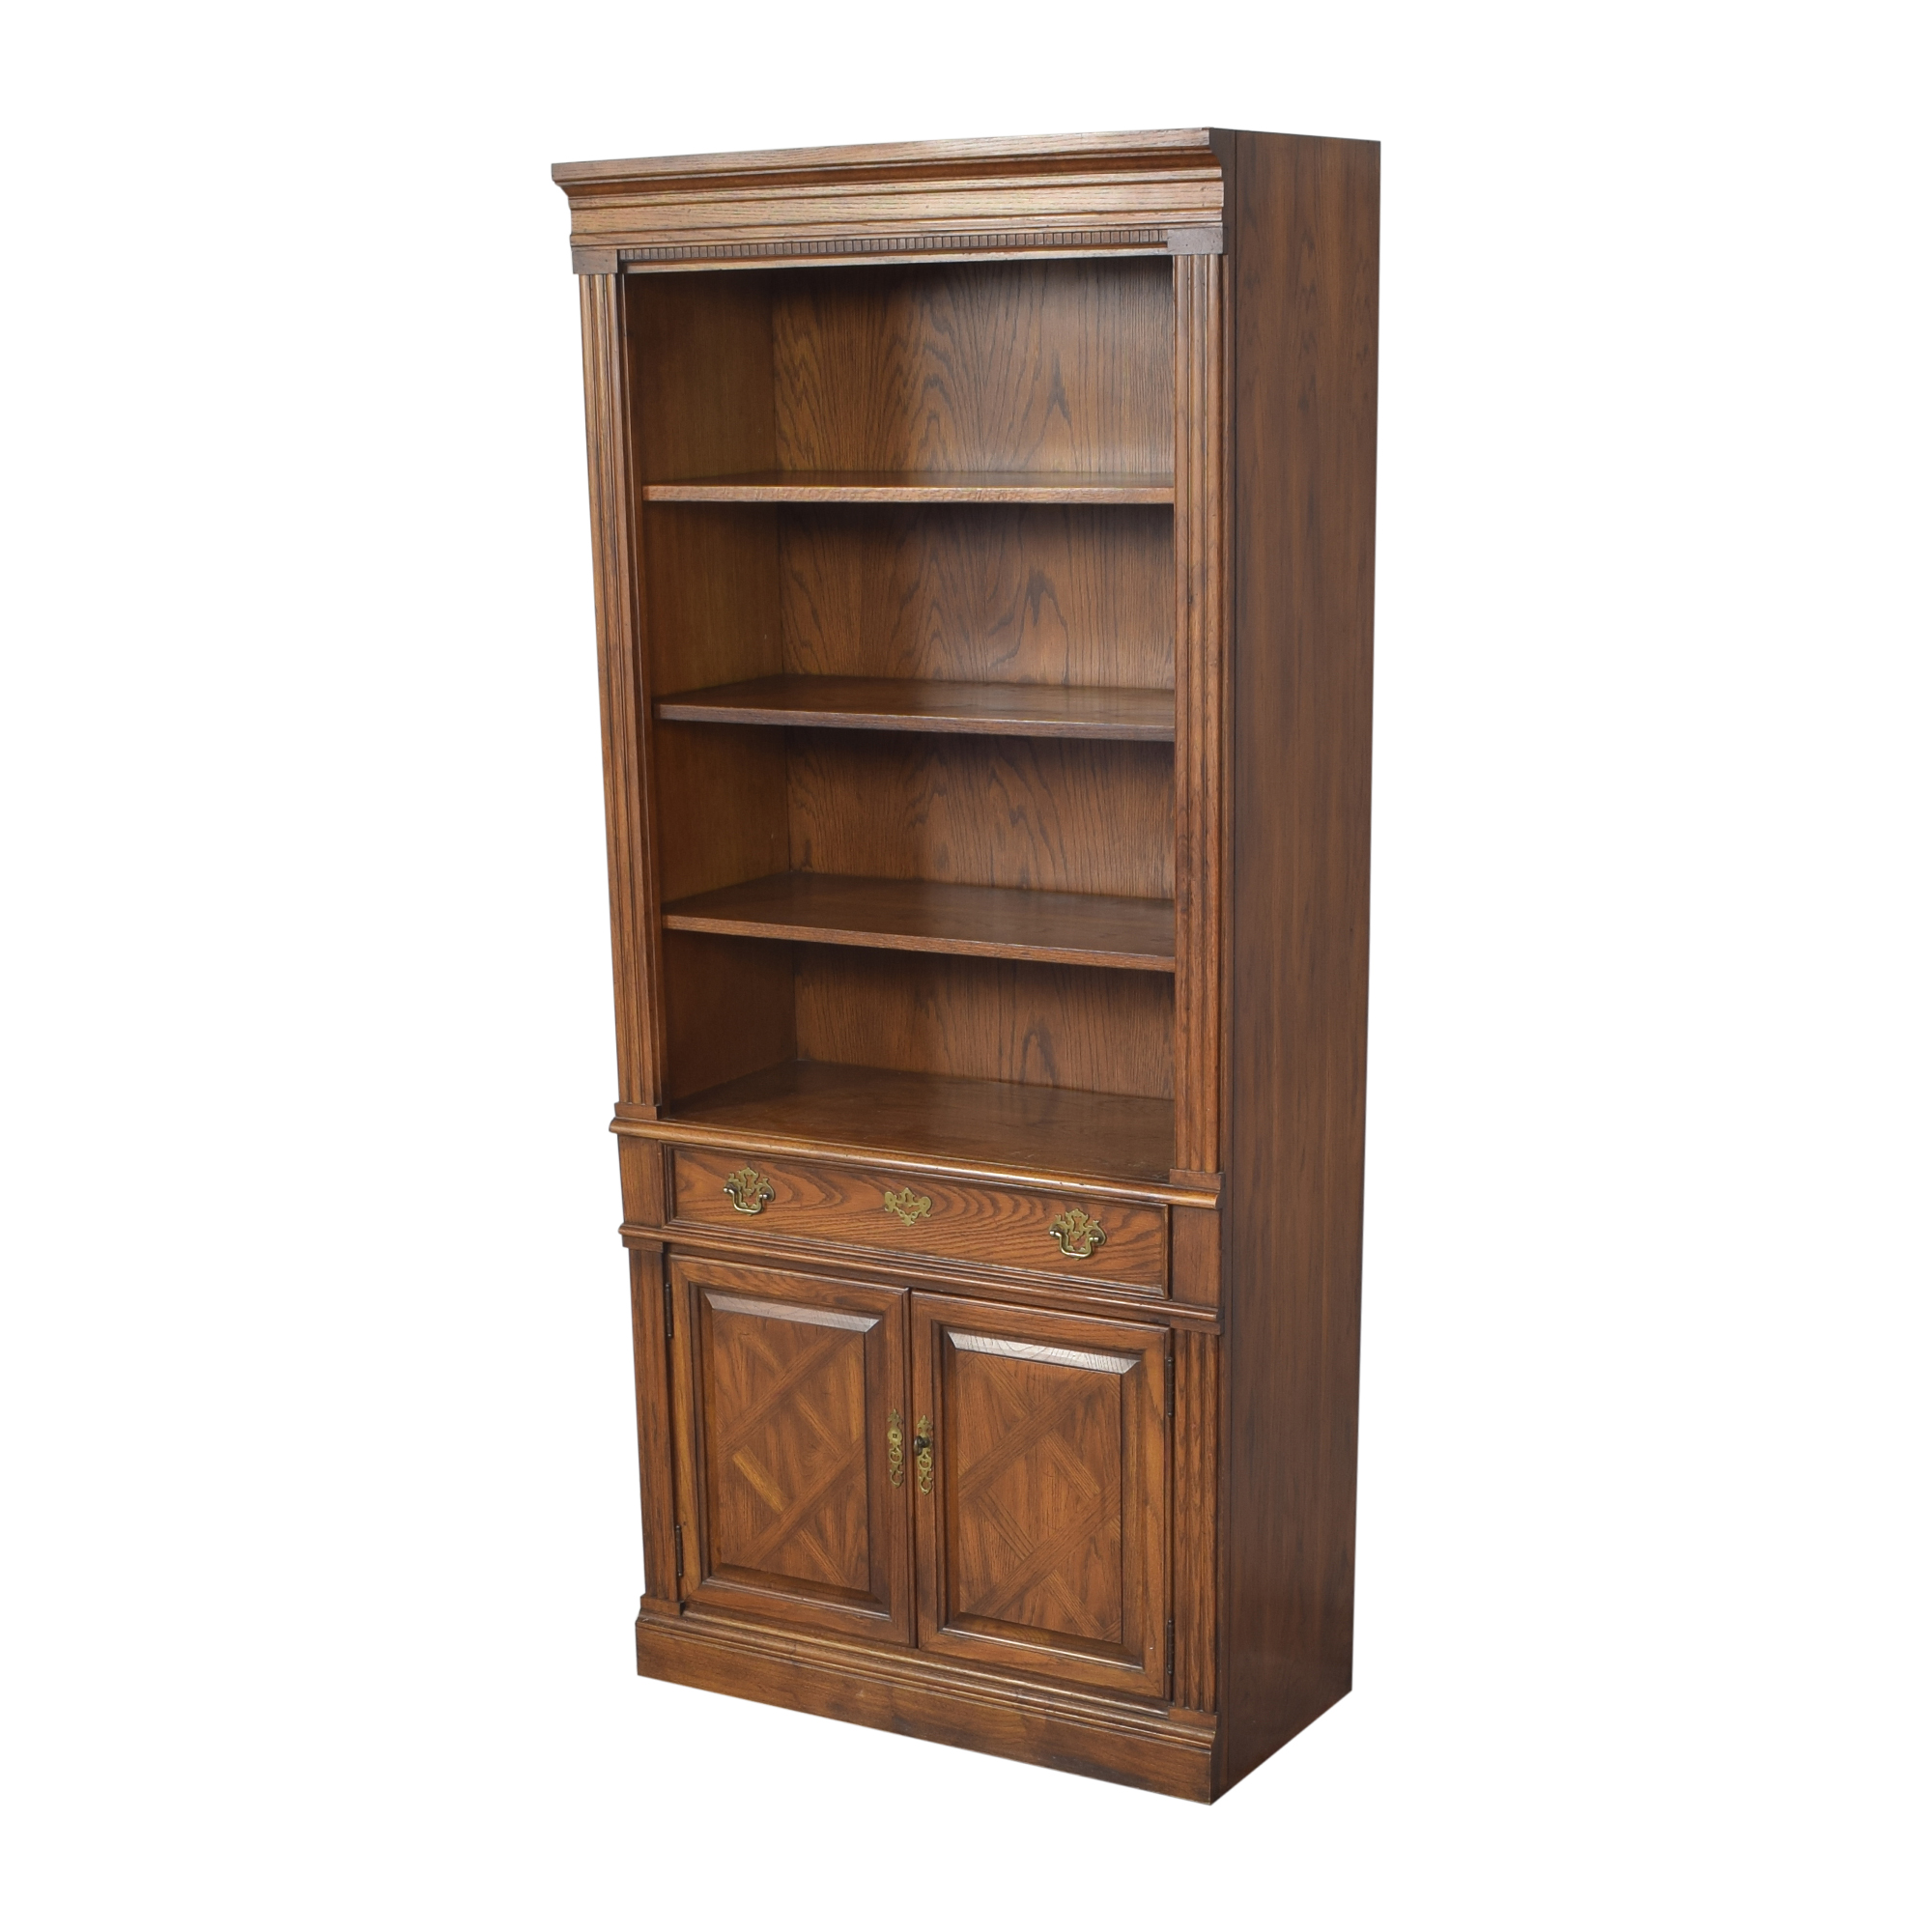 Thomasville Thomasville Bookcase Cabinet discount